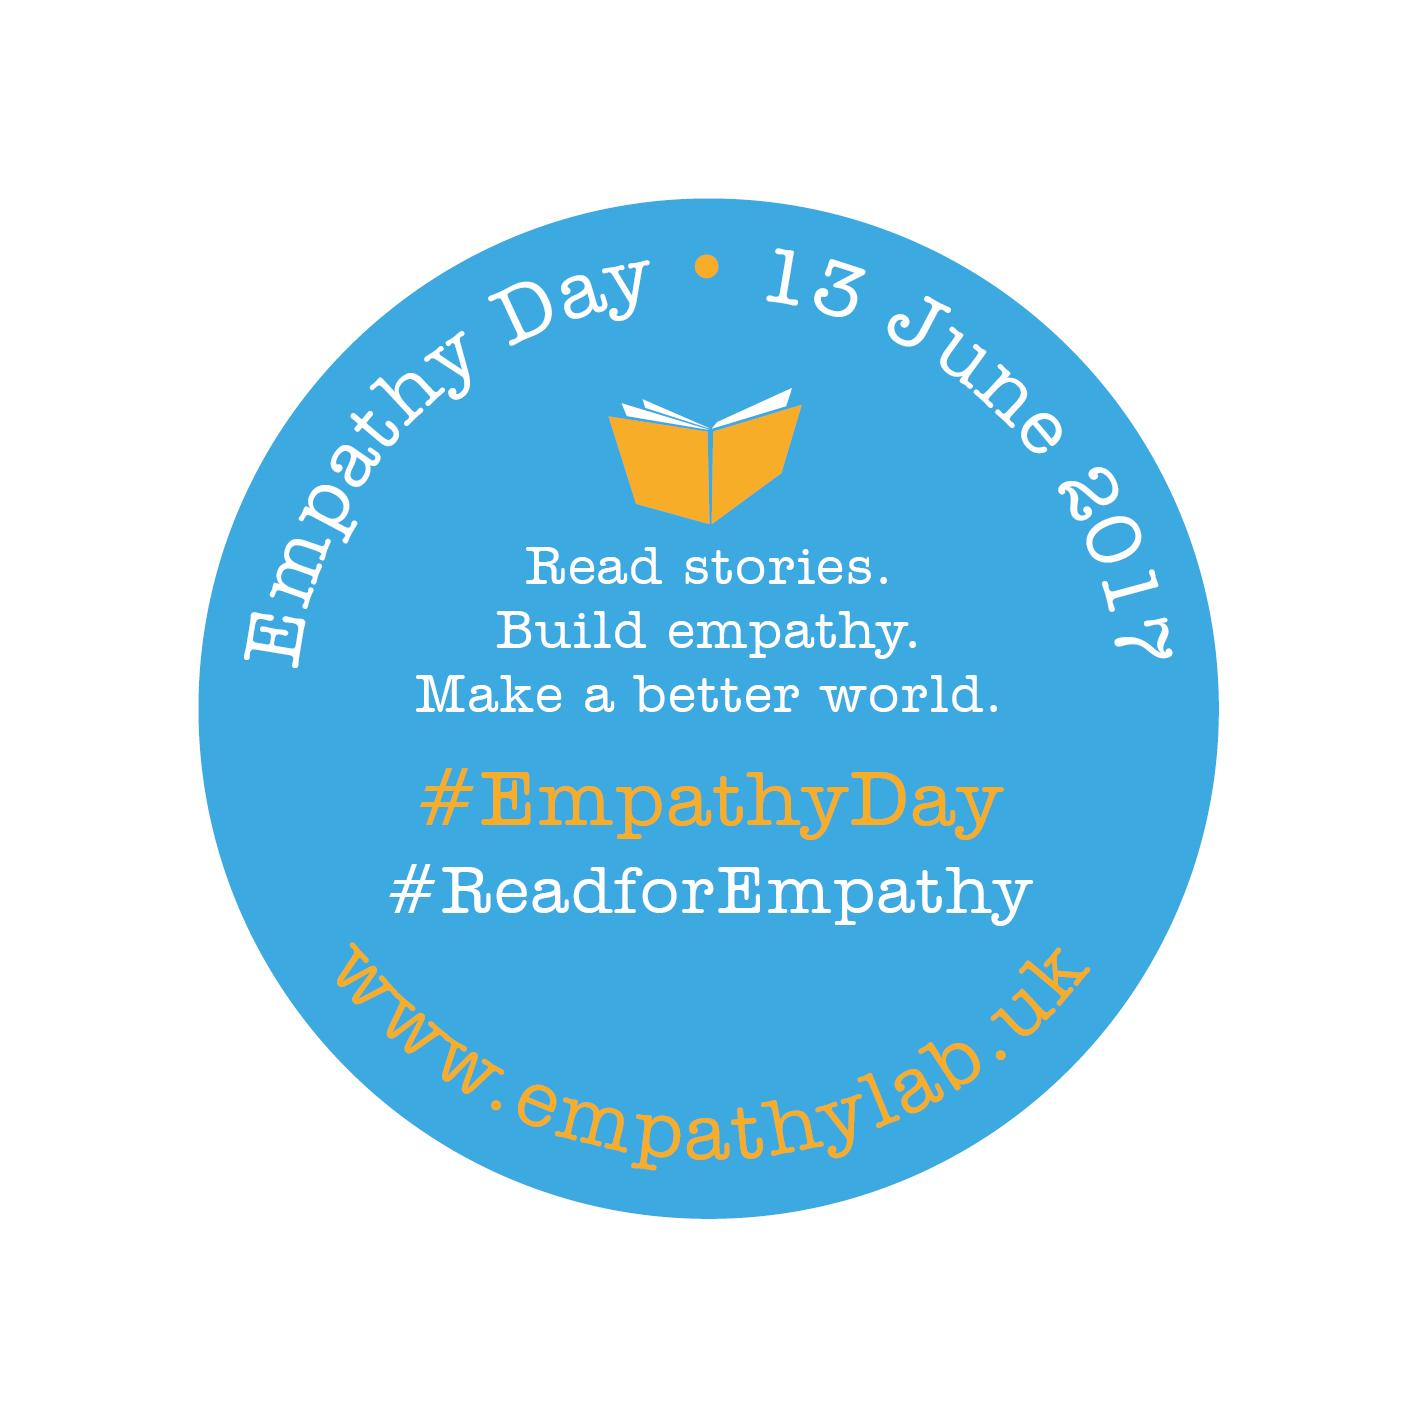 Empathy_Day_Badge2 (2).jpg